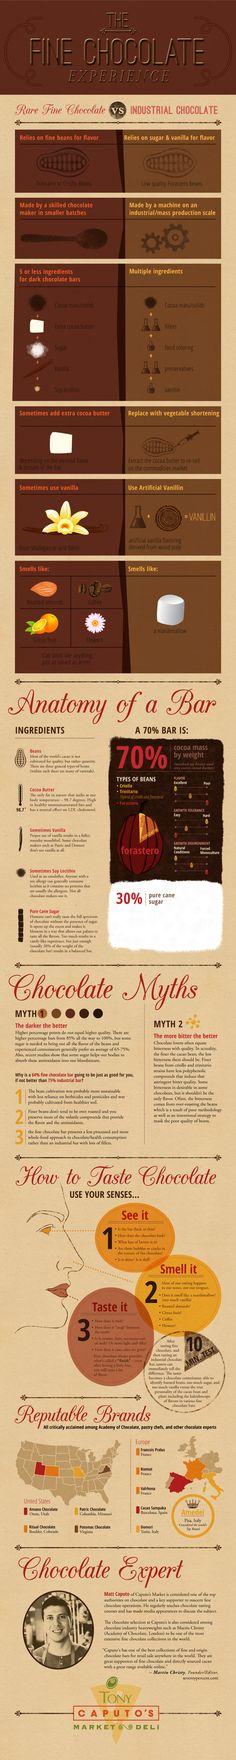 http://blog.caputosdeli.com/wp-content/uploads/2012/06/Fine-Chocolate-Experience-Infographic.jpg